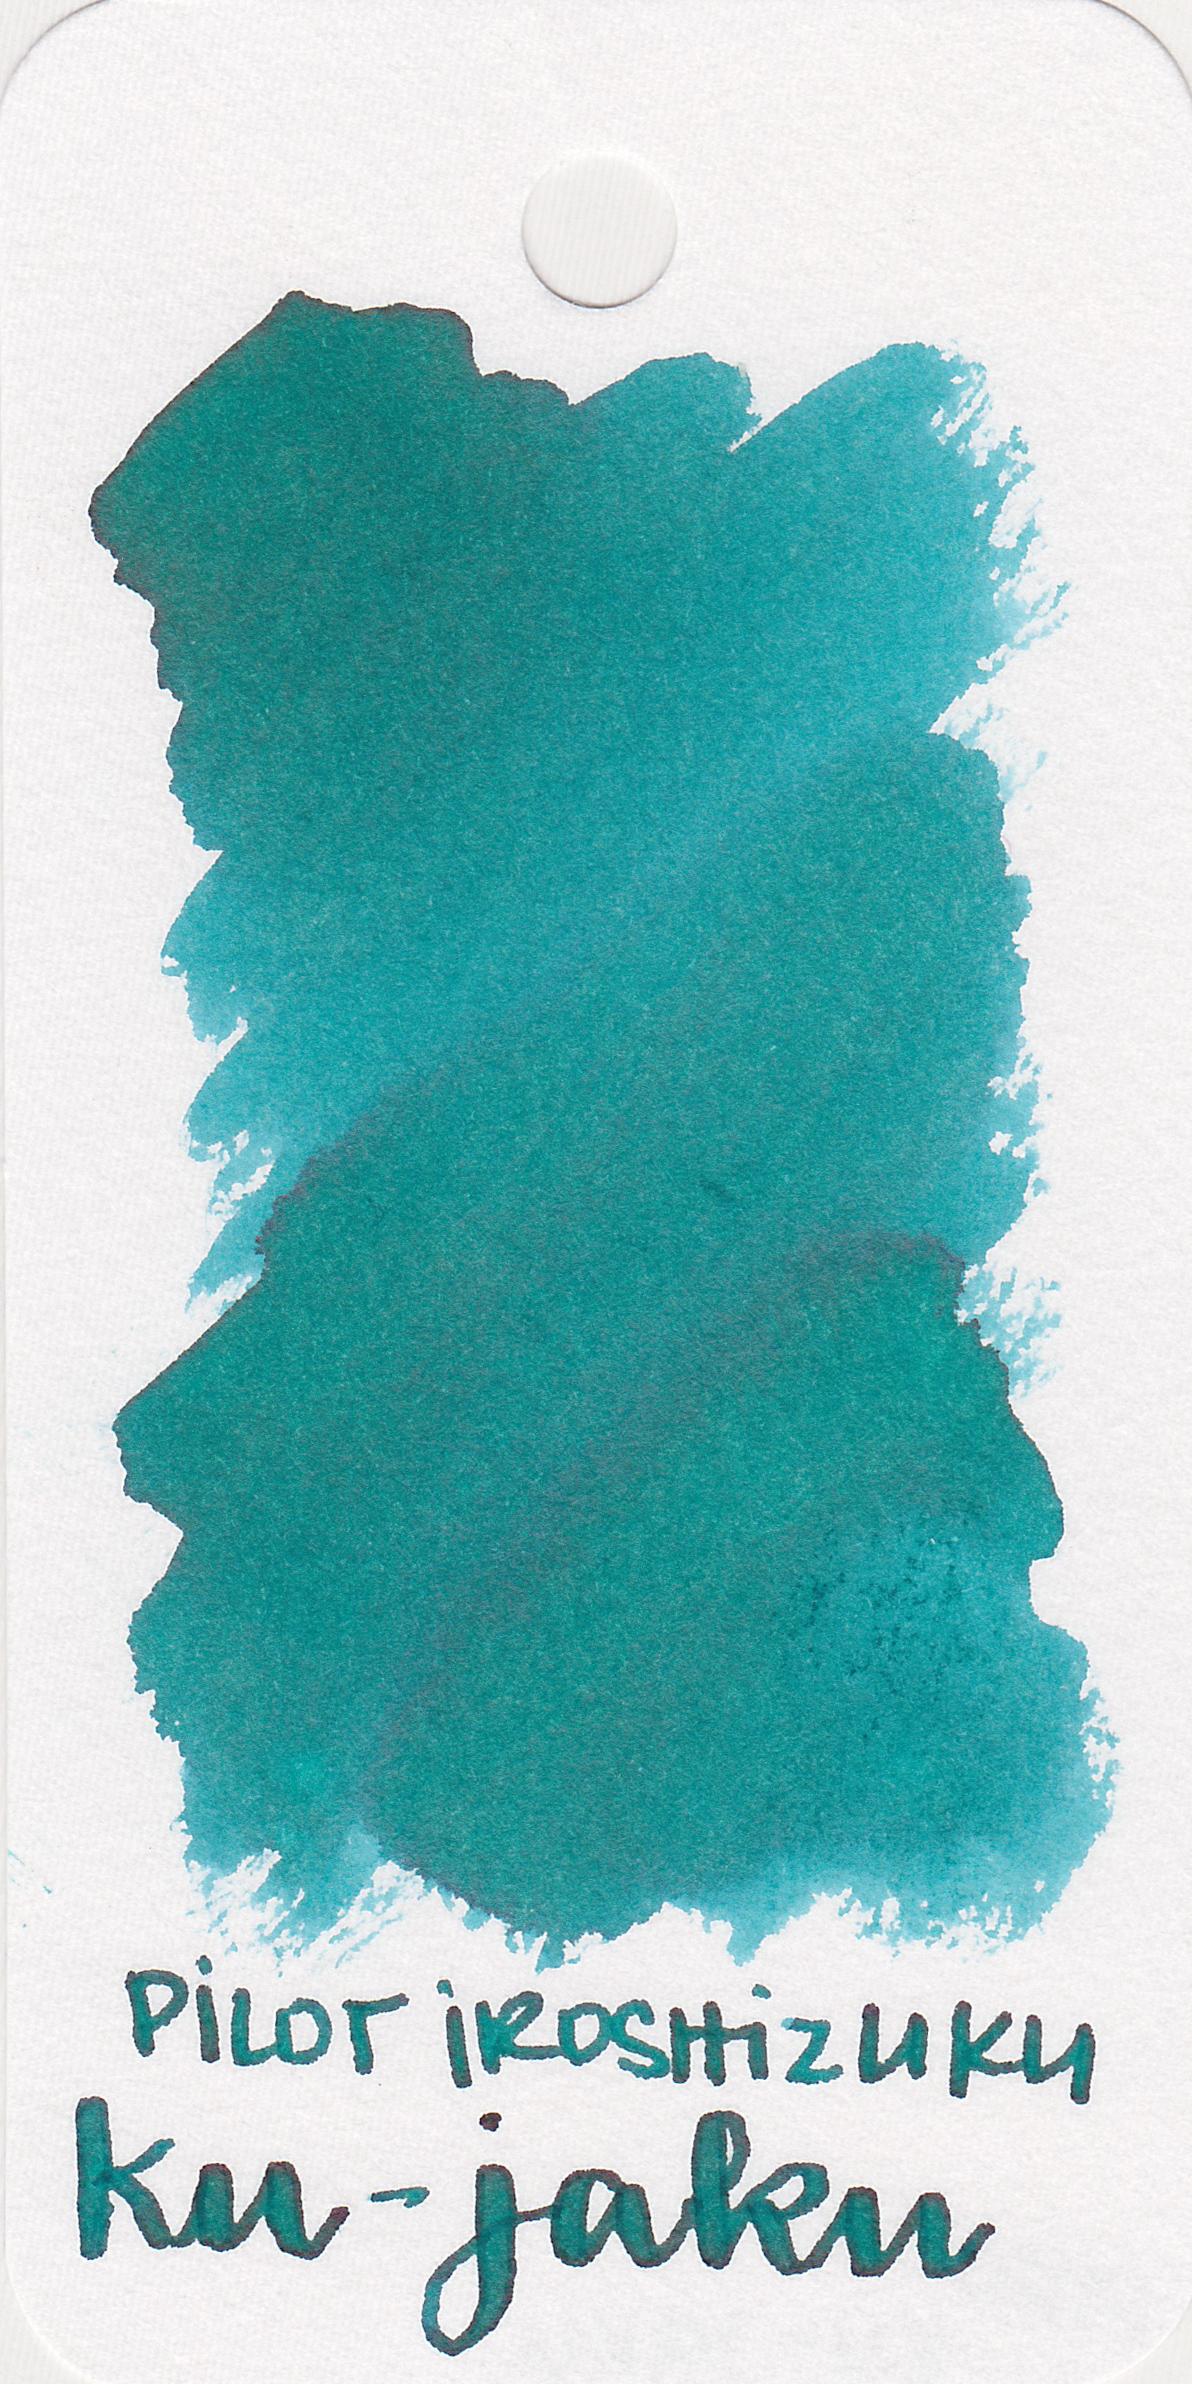 The color: - Ku-jaku is a gorgeous medium teal, but let's face it, I'm biased. I love teal.